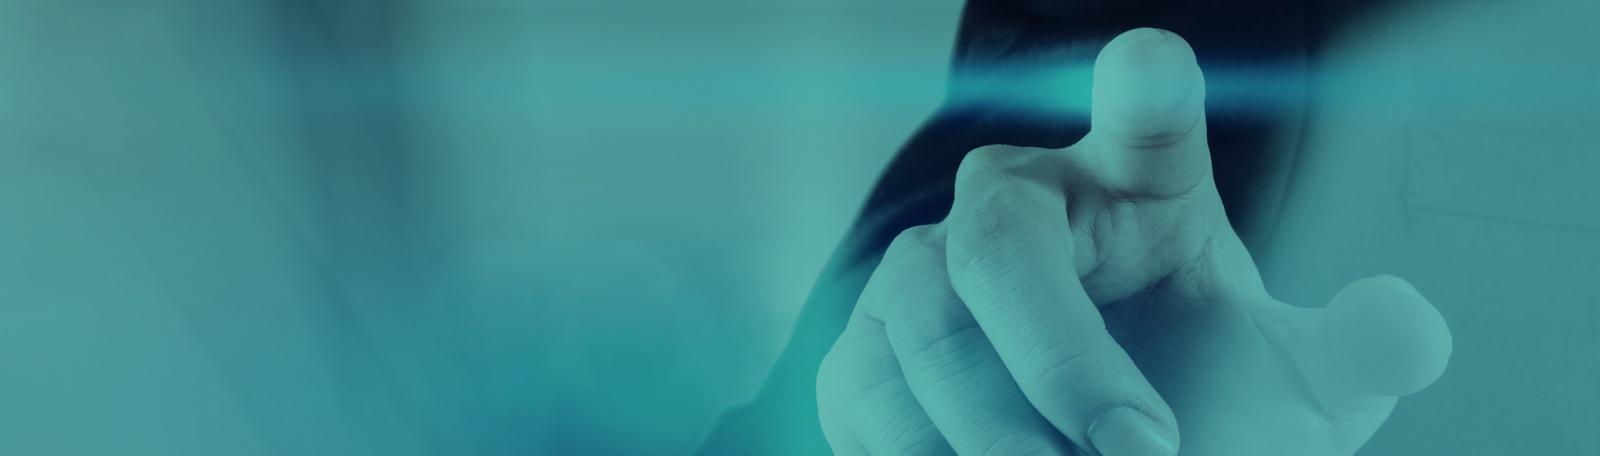 Matrix digital banking platform insights